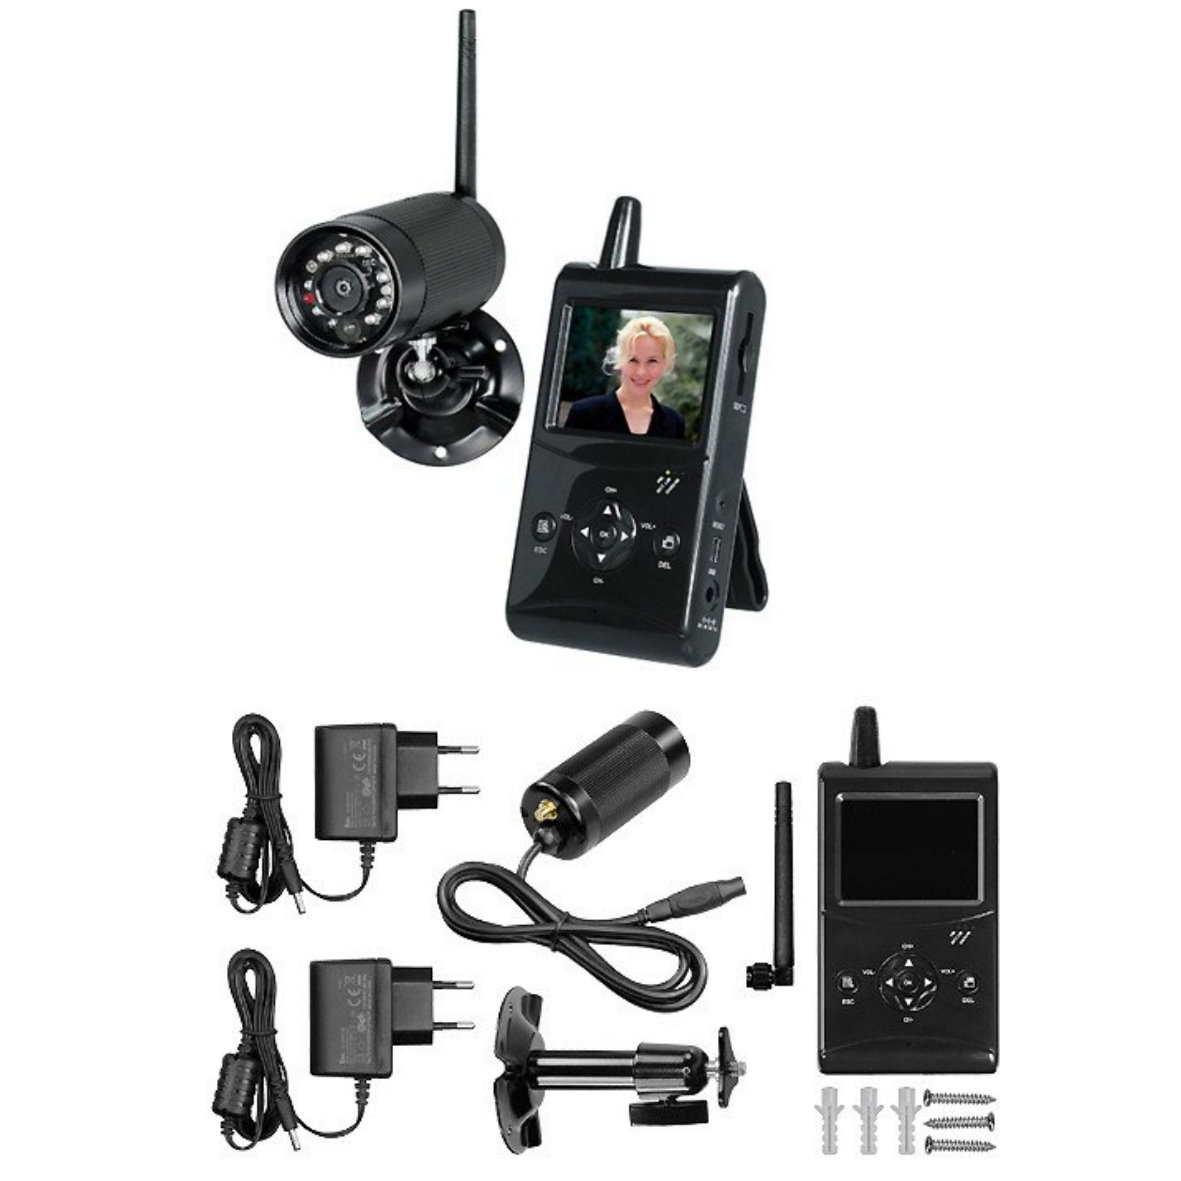 pentatech funk video berwachung kamera monitor funkkkamera wireless set digital ebay. Black Bedroom Furniture Sets. Home Design Ideas